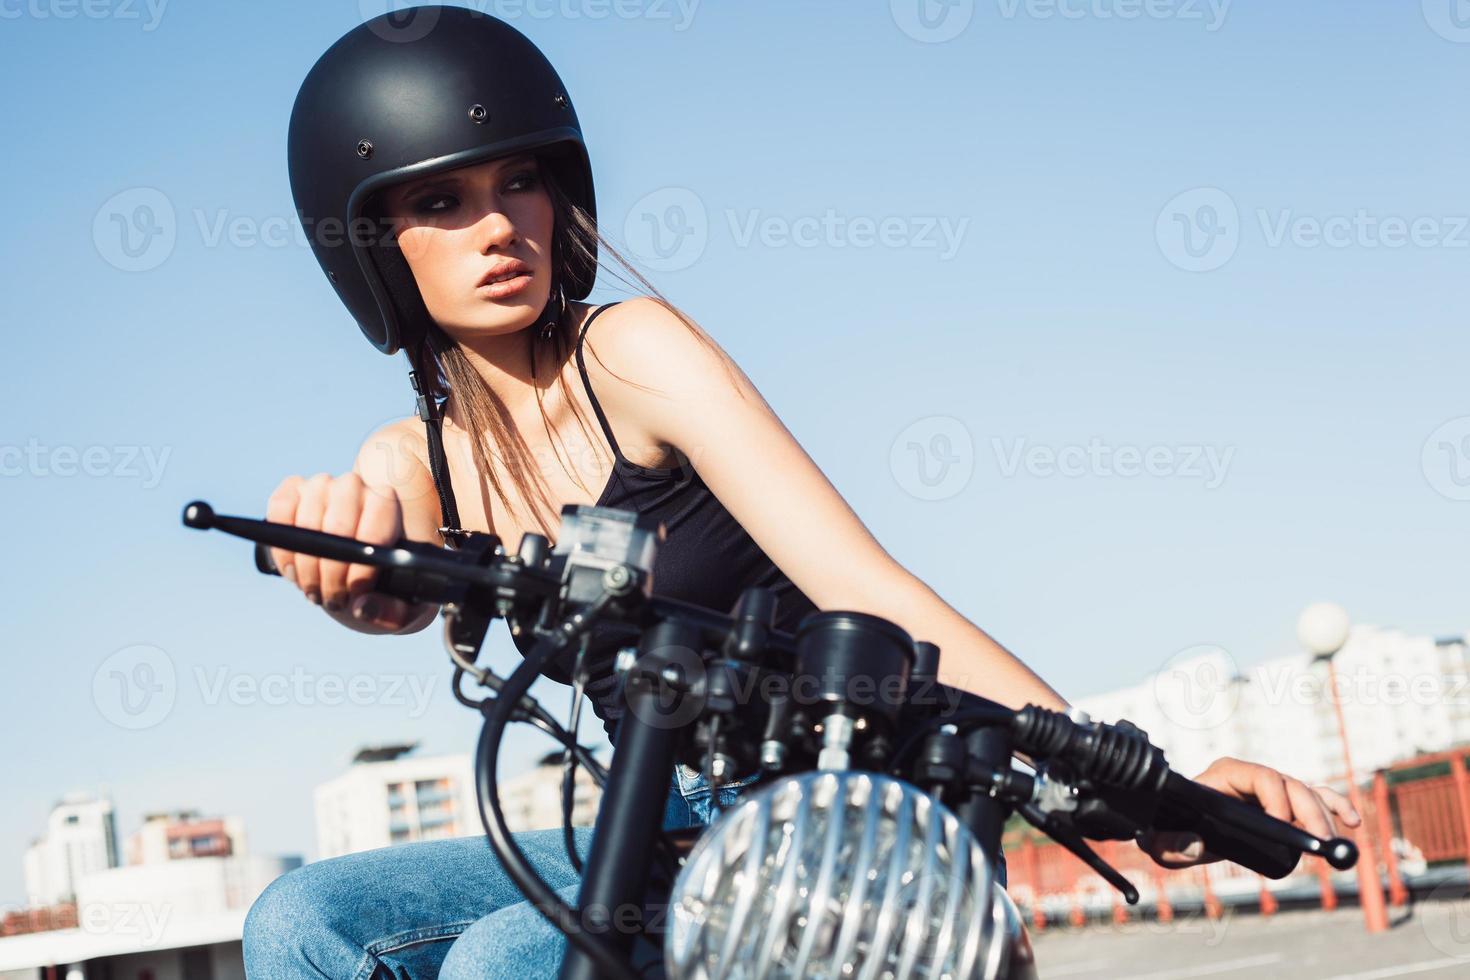 biker meisje zittend op vintage aangepaste motorfiets foto